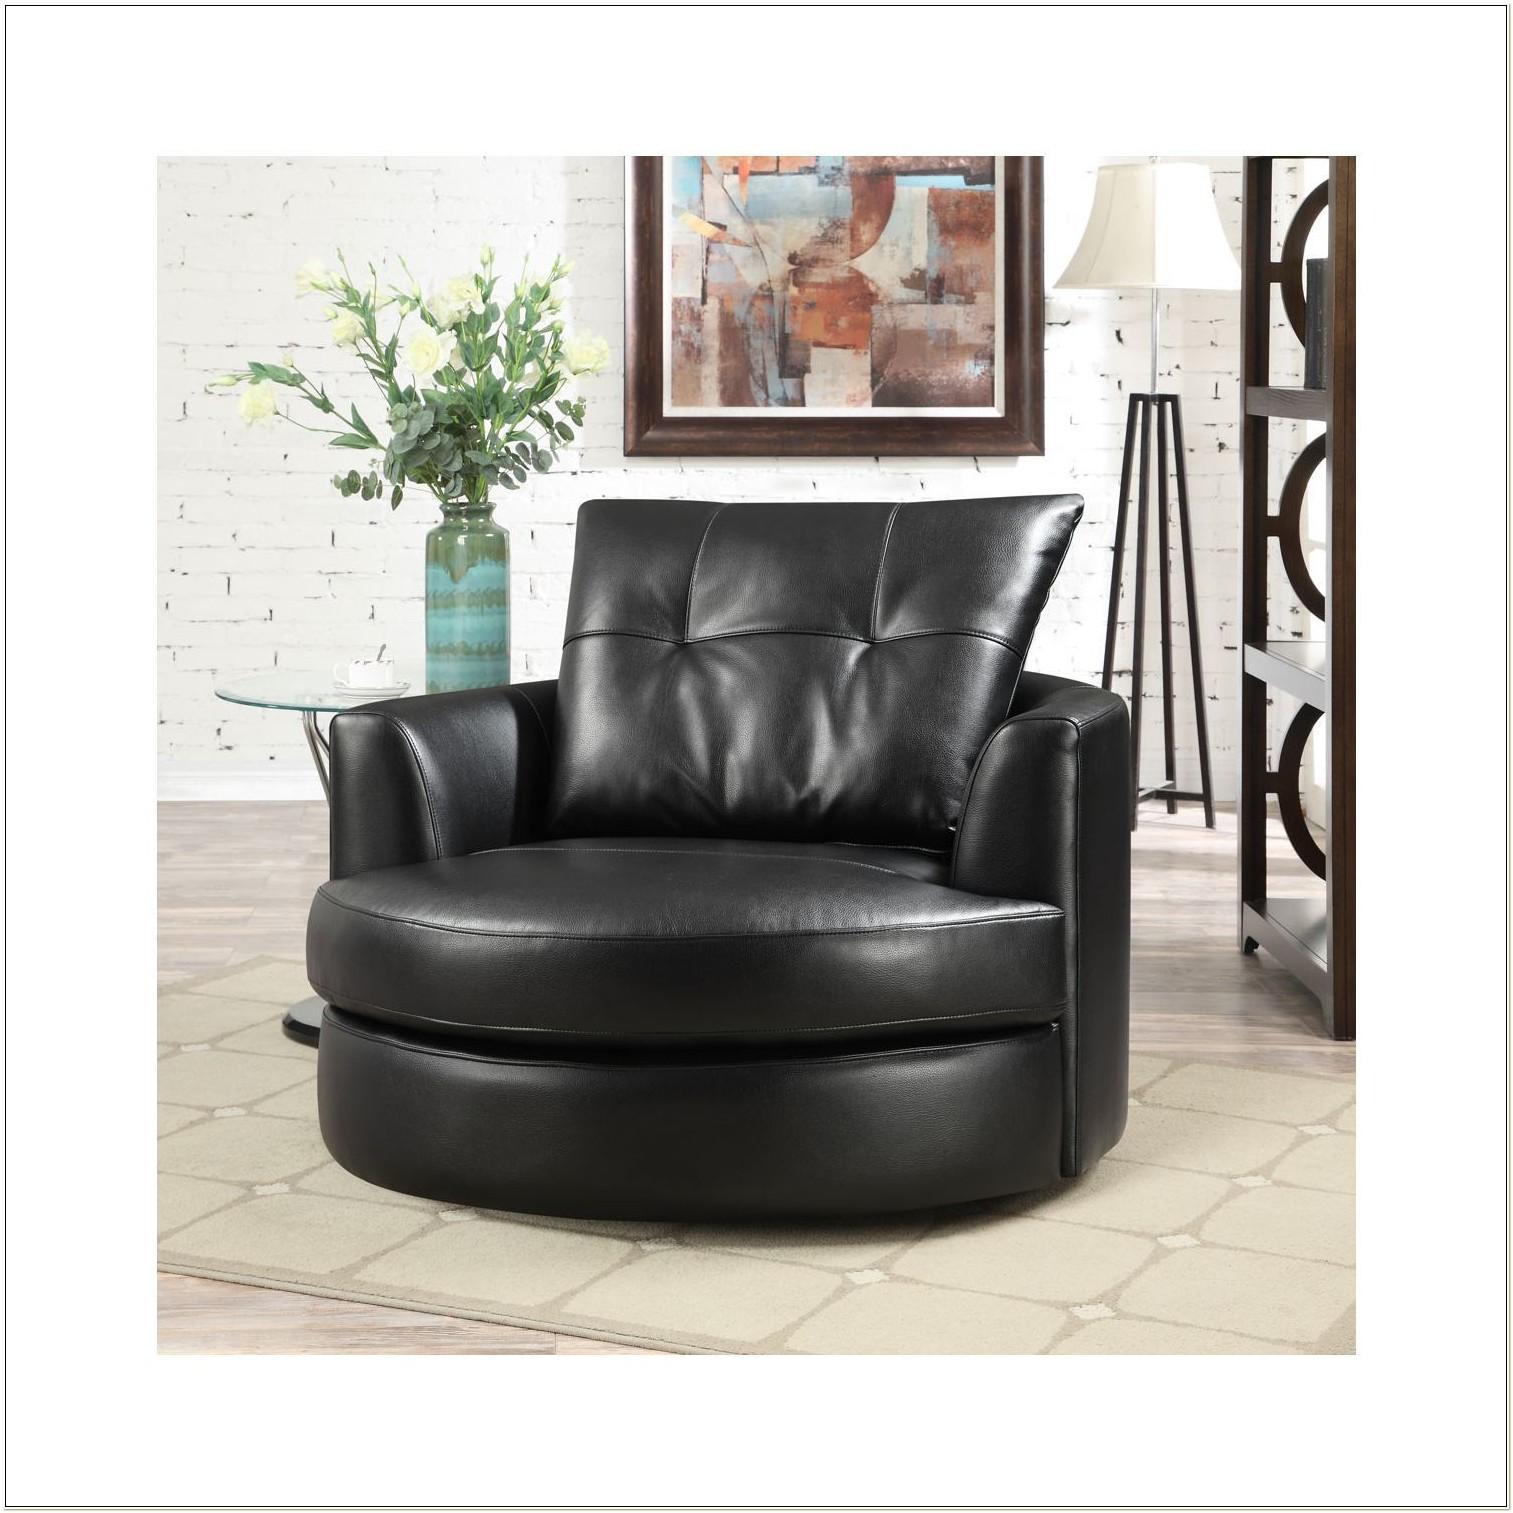 Sams Club Black Leather Chair